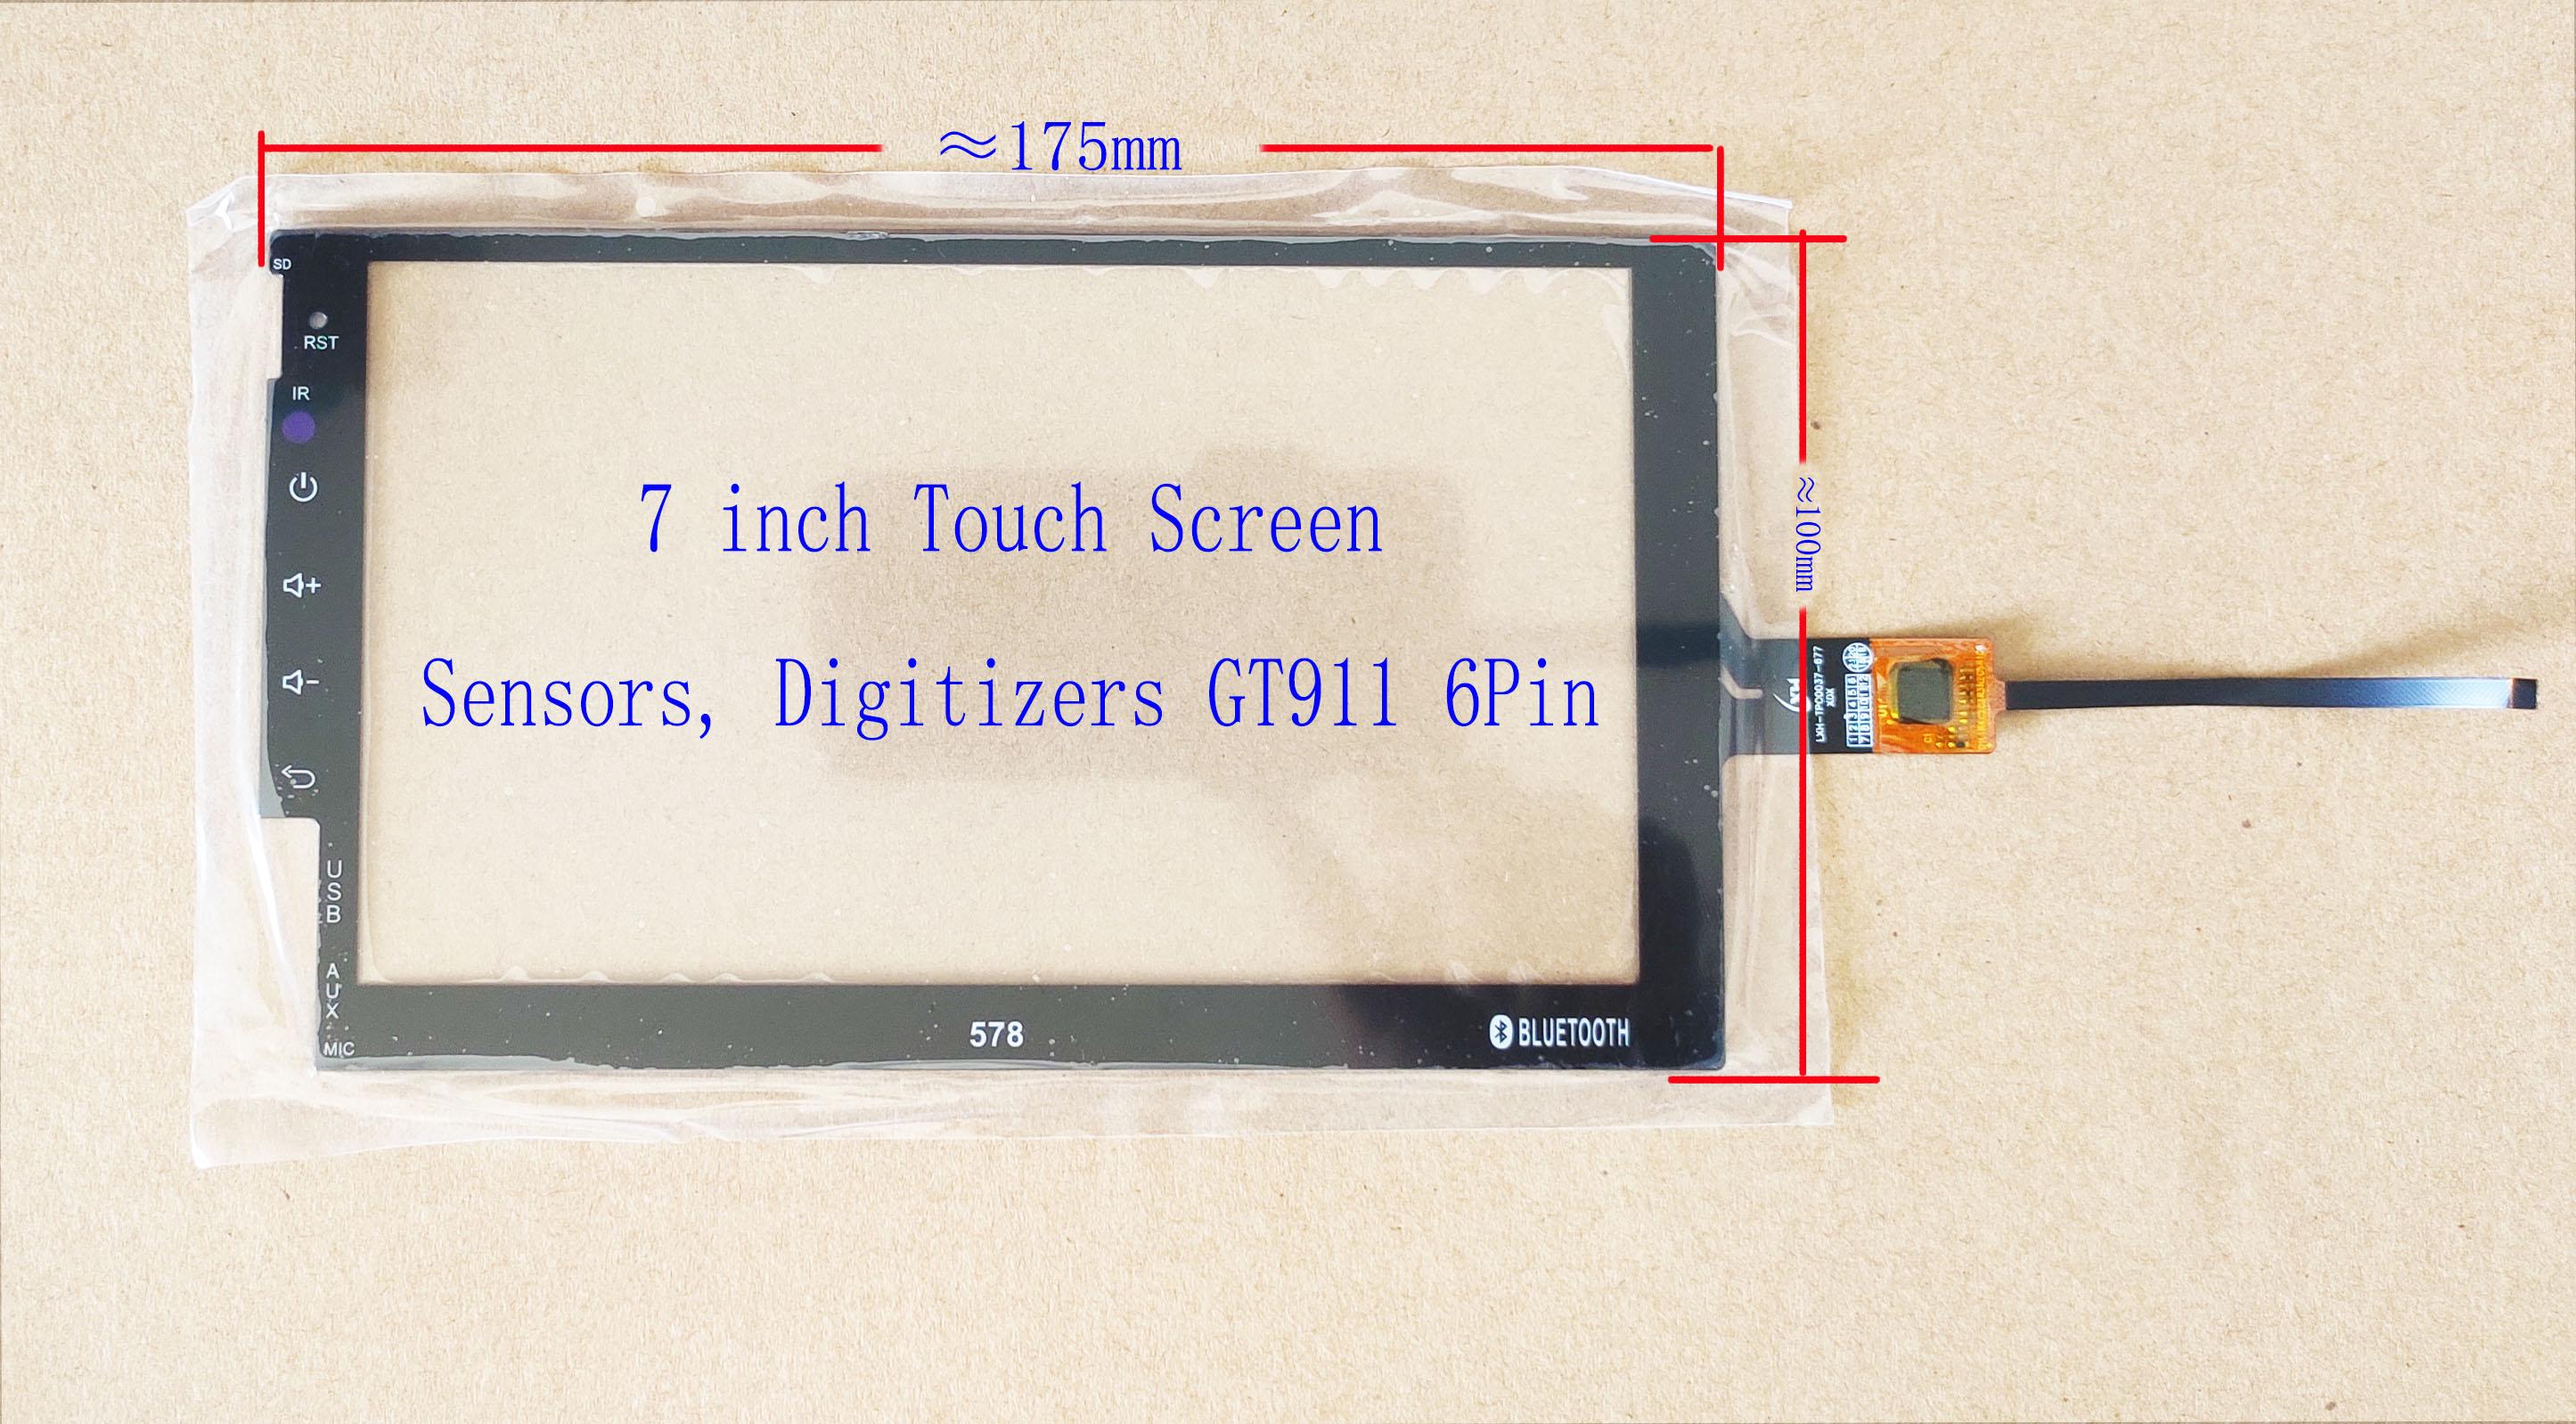 7 pulgadas 175*100mm Capaivitve sensores táctiles digitalizadores Chevrolet Hyundai coche Radio Univesal GT911/615 6pin PI-707 LXH-TPC0037-077